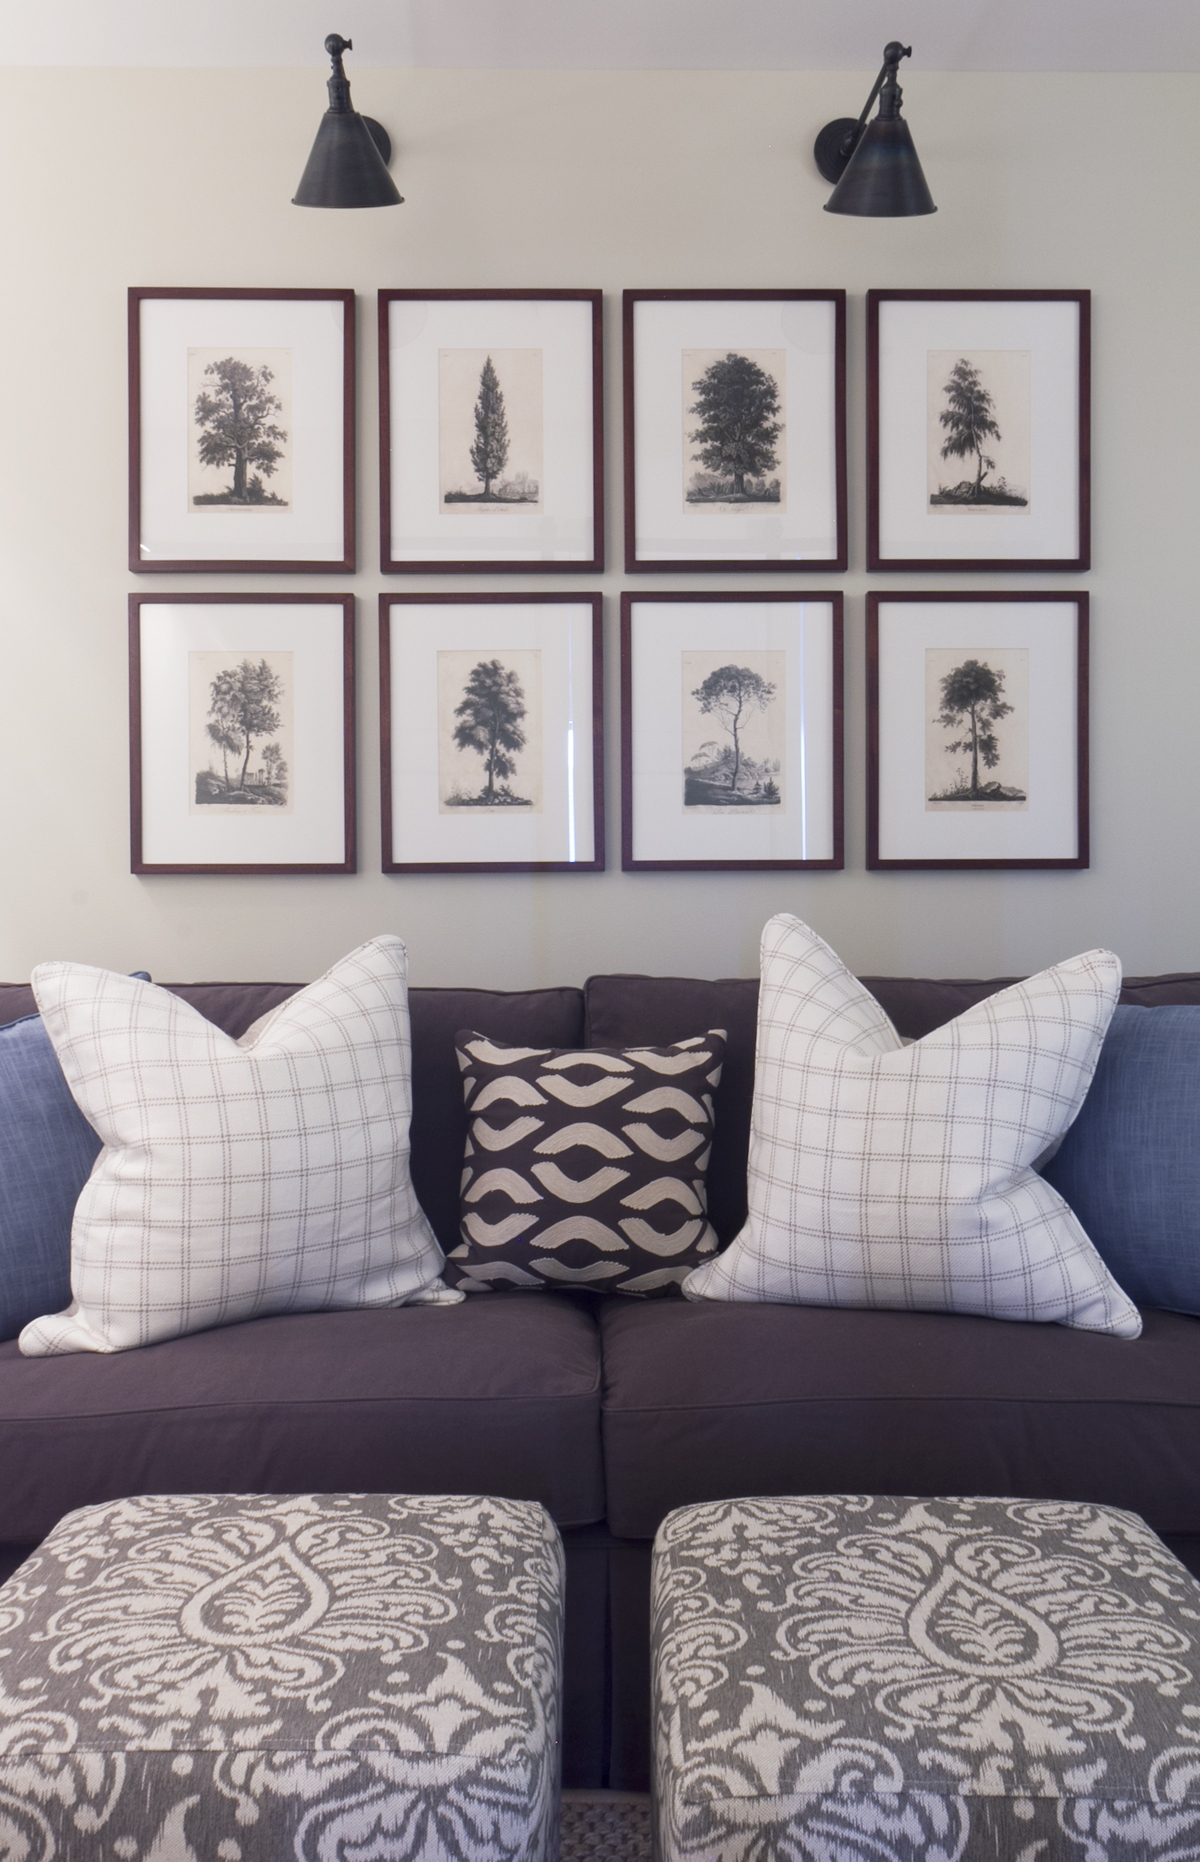 Lisa-Gabrielson-Designbrookwood-trees with lights.jpg